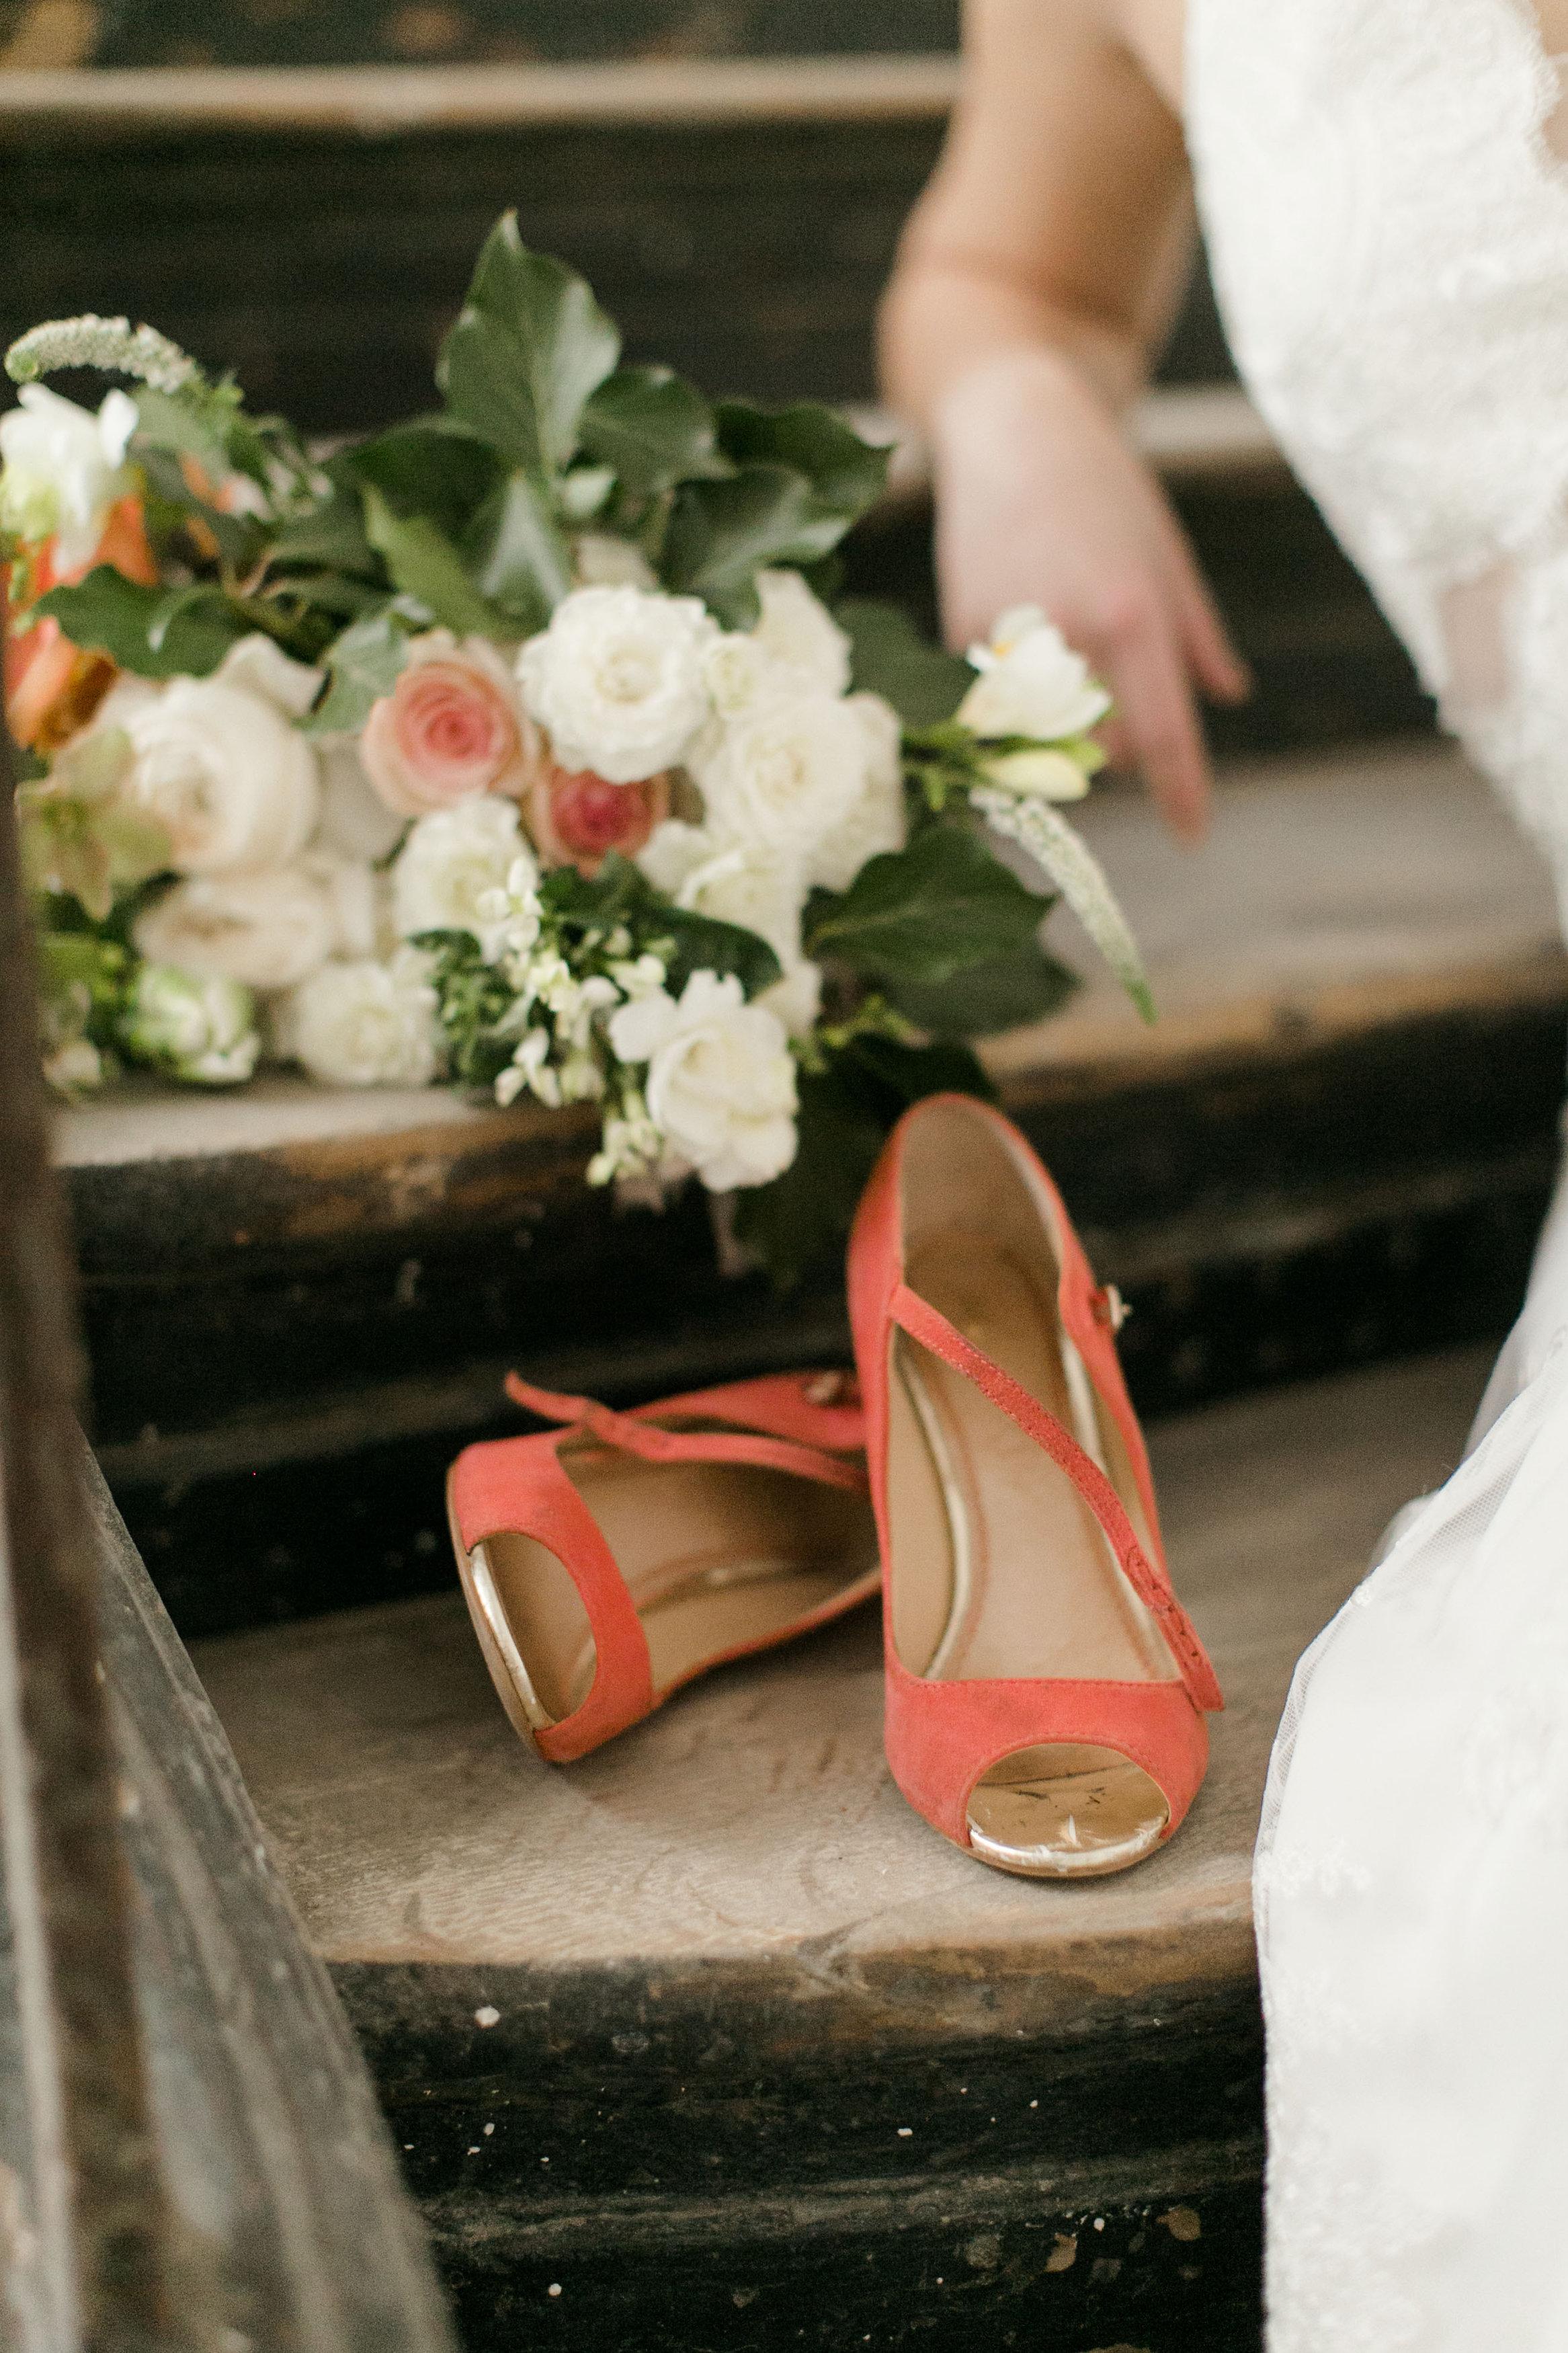 toronto-wedding-photographer-richelle-hunter-photography-new-york-paris-france-inspiration-201.jpg